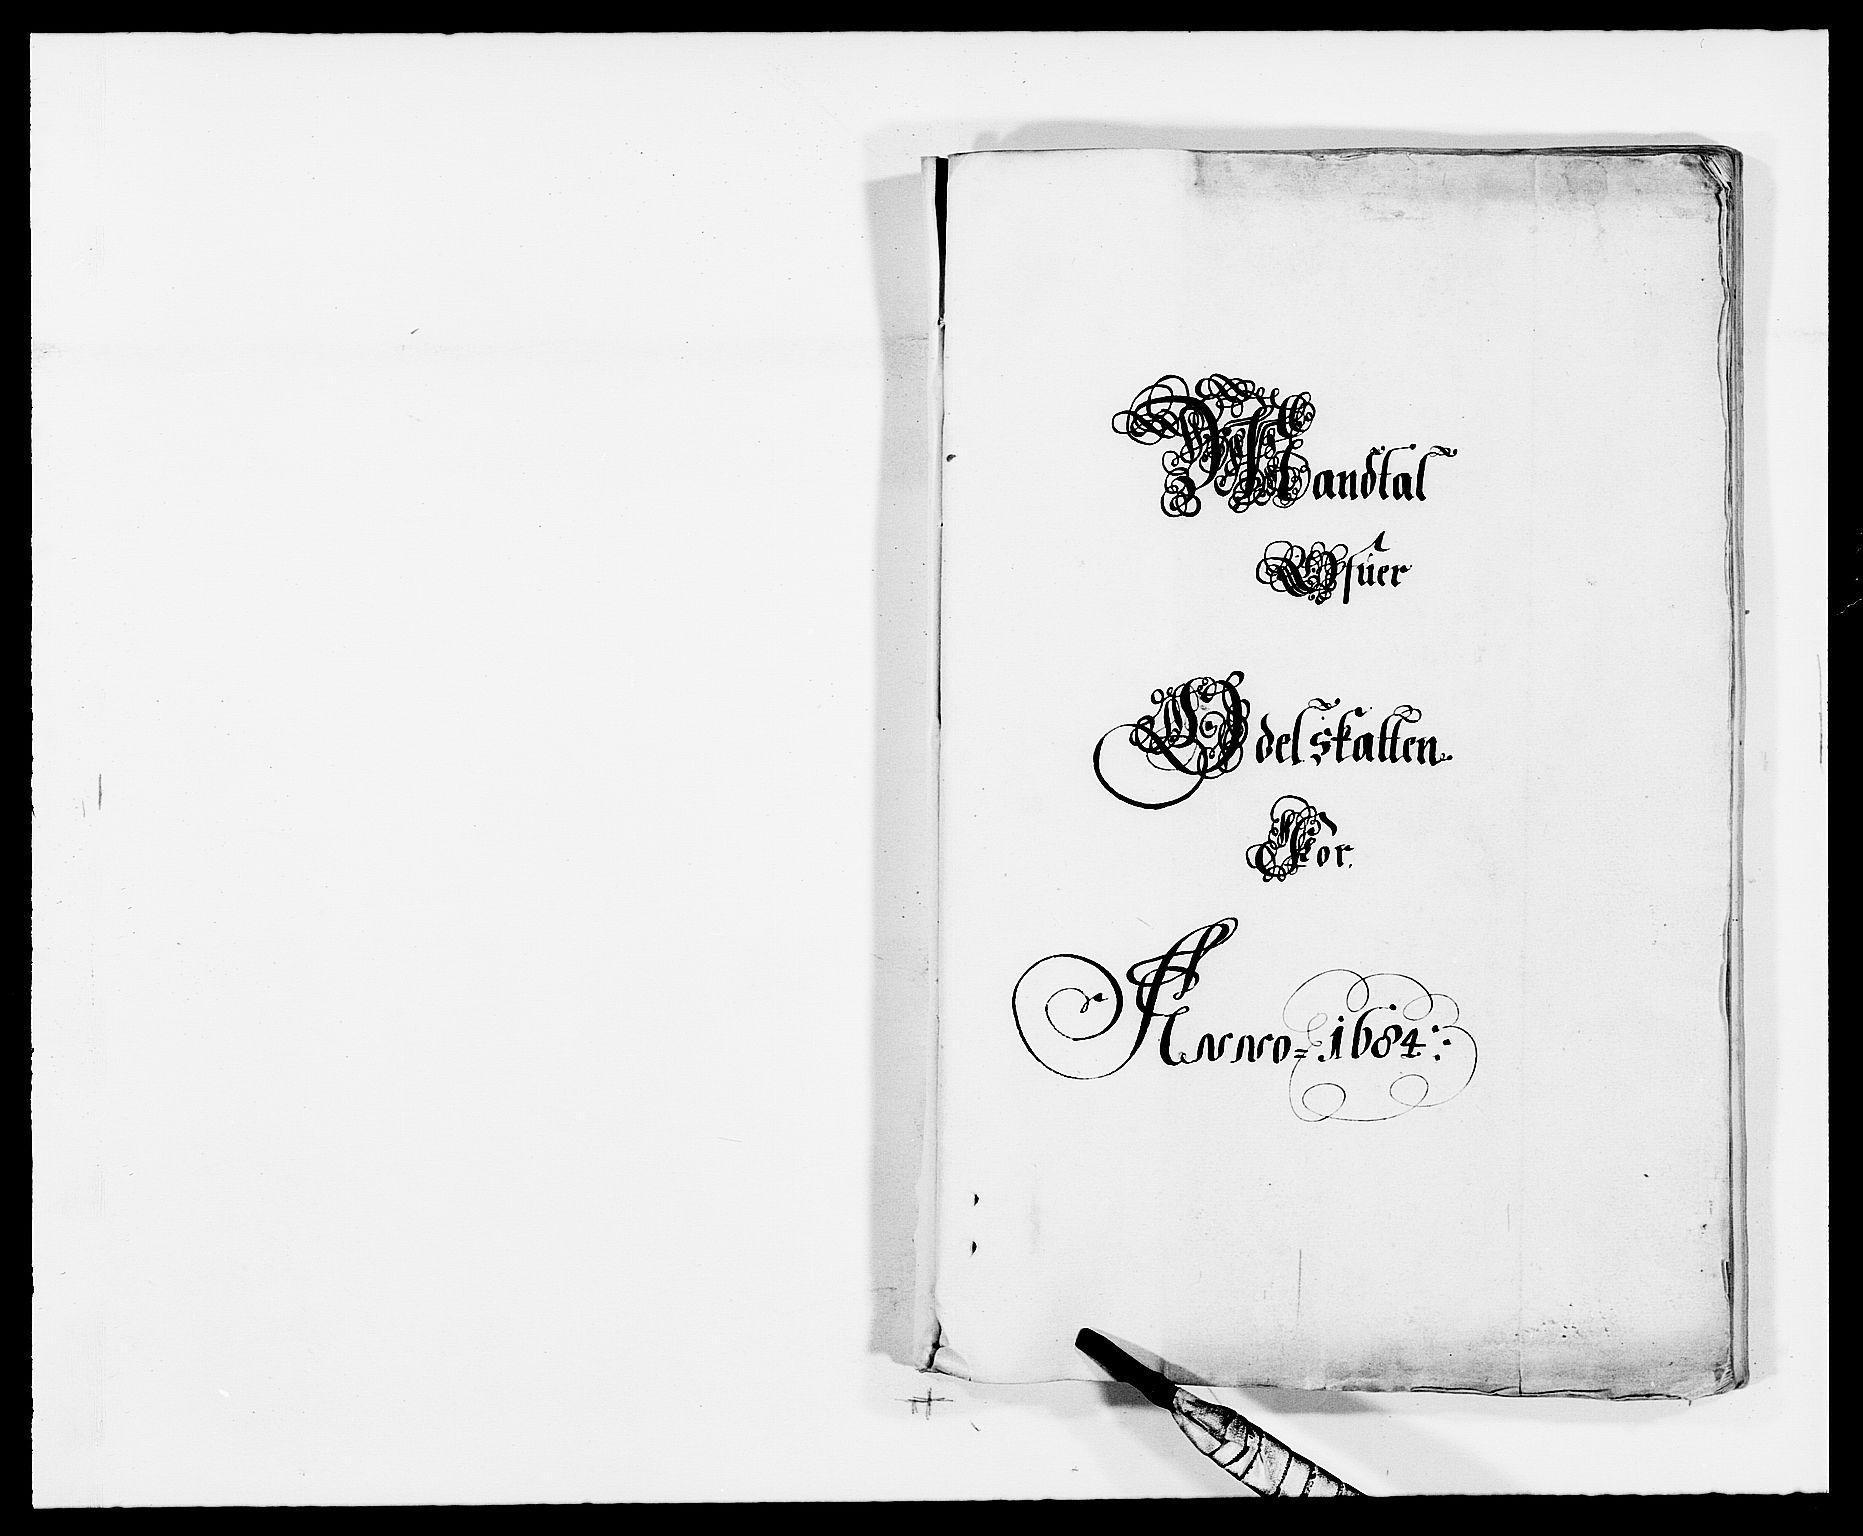 RA, Rentekammeret inntil 1814, Reviderte regnskaper, Fogderegnskap, R32/L1854: Fogderegnskap Jarlsberg grevskap, 1684, s. 213